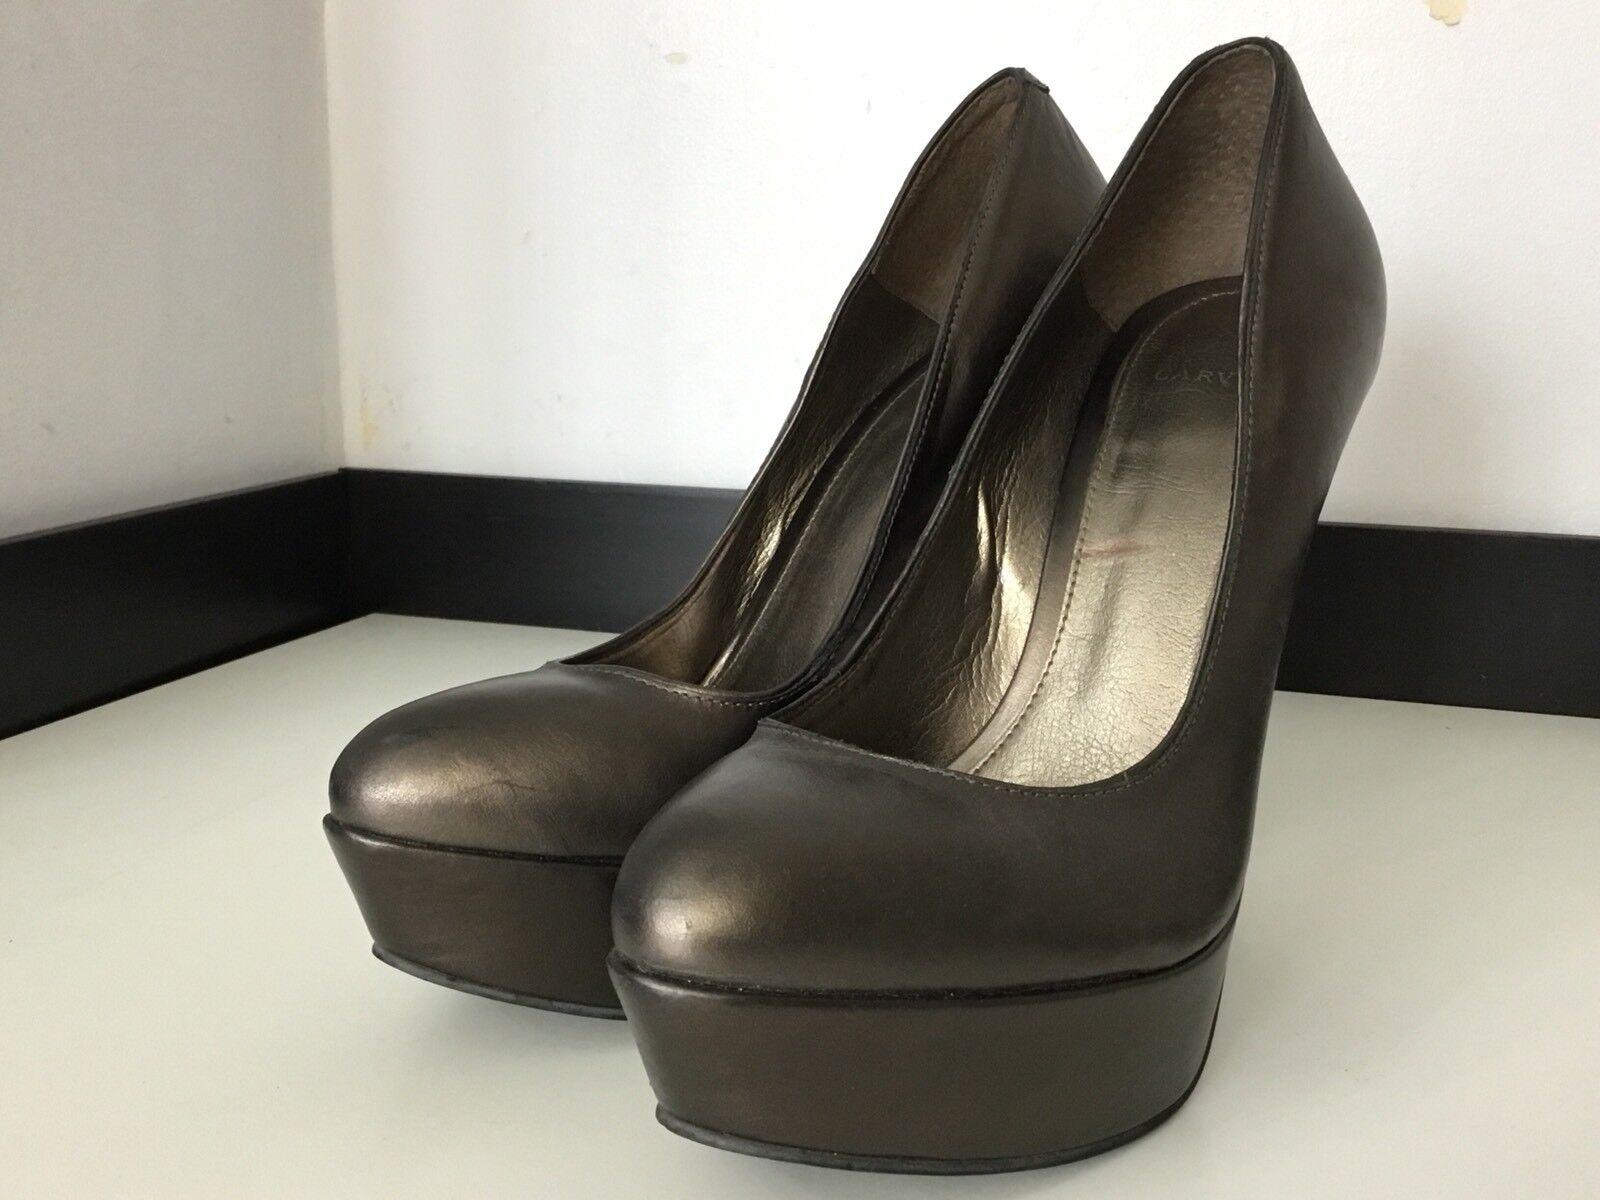 Carvela Bronze High Heel Heel Heel schuhe, Leather, Größe Uk 6 Eu 39 VGC e5214f